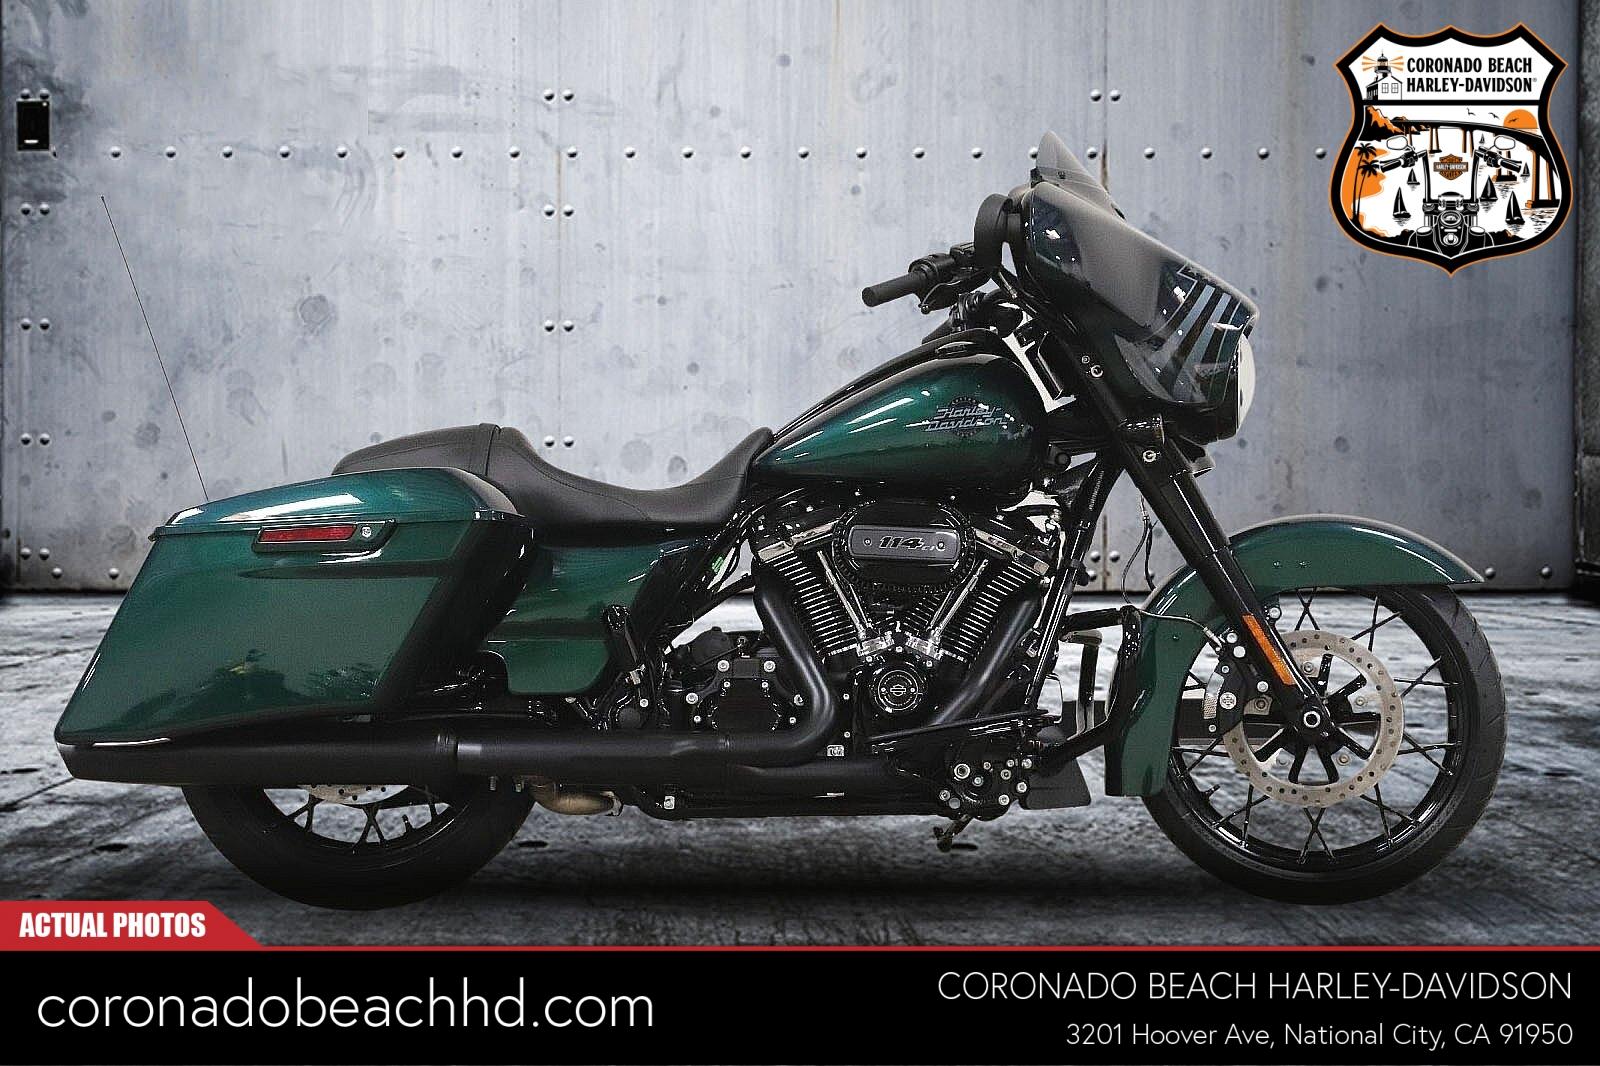 2021 Harley-Davidson Street Glide Special [9]